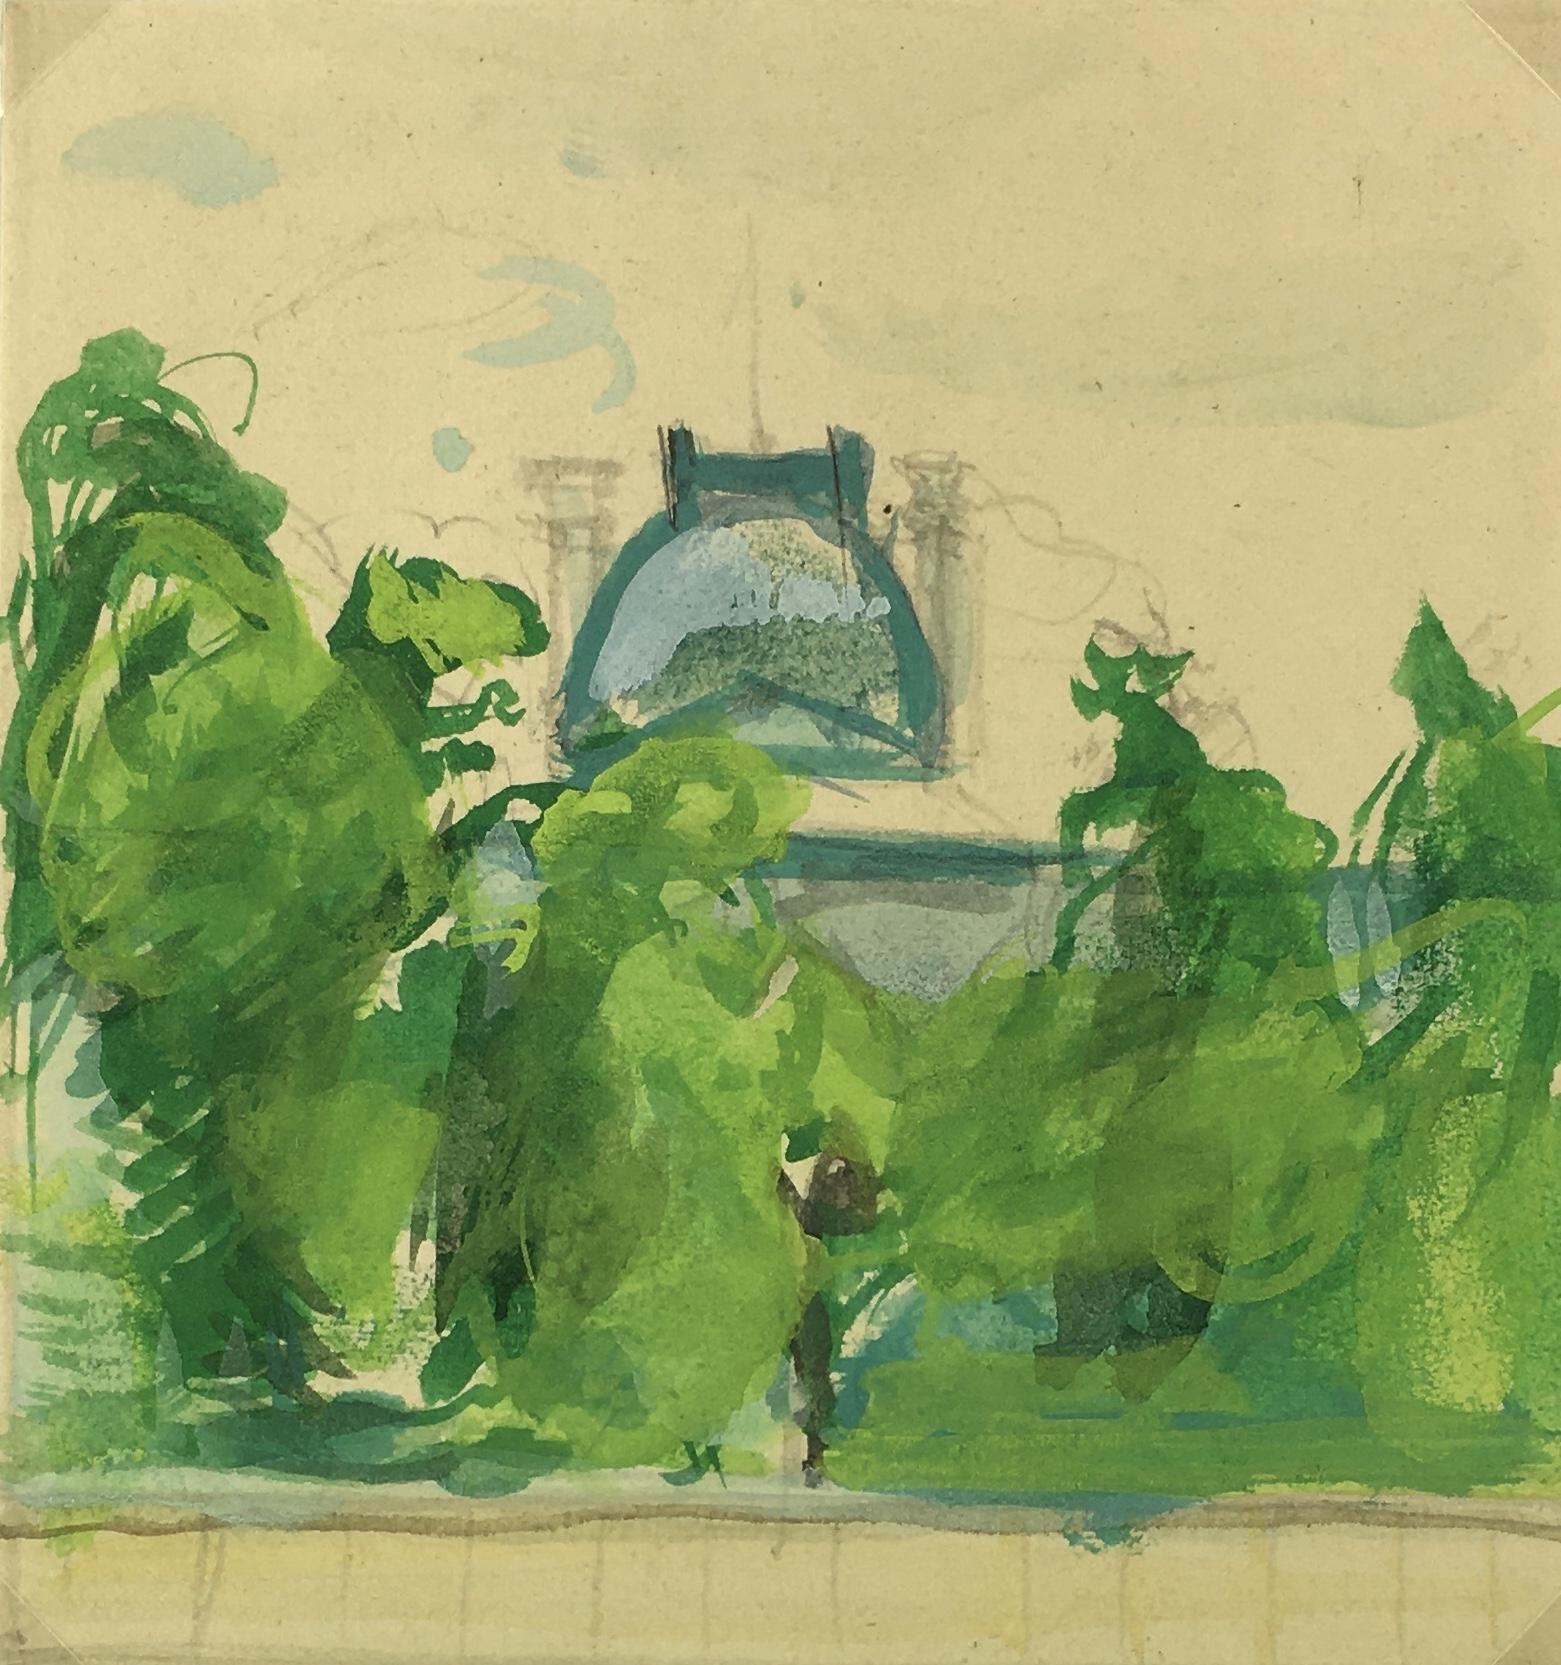 Paris, France Original Art - Paris, Key Mitsuuchi(1948-01), 1990